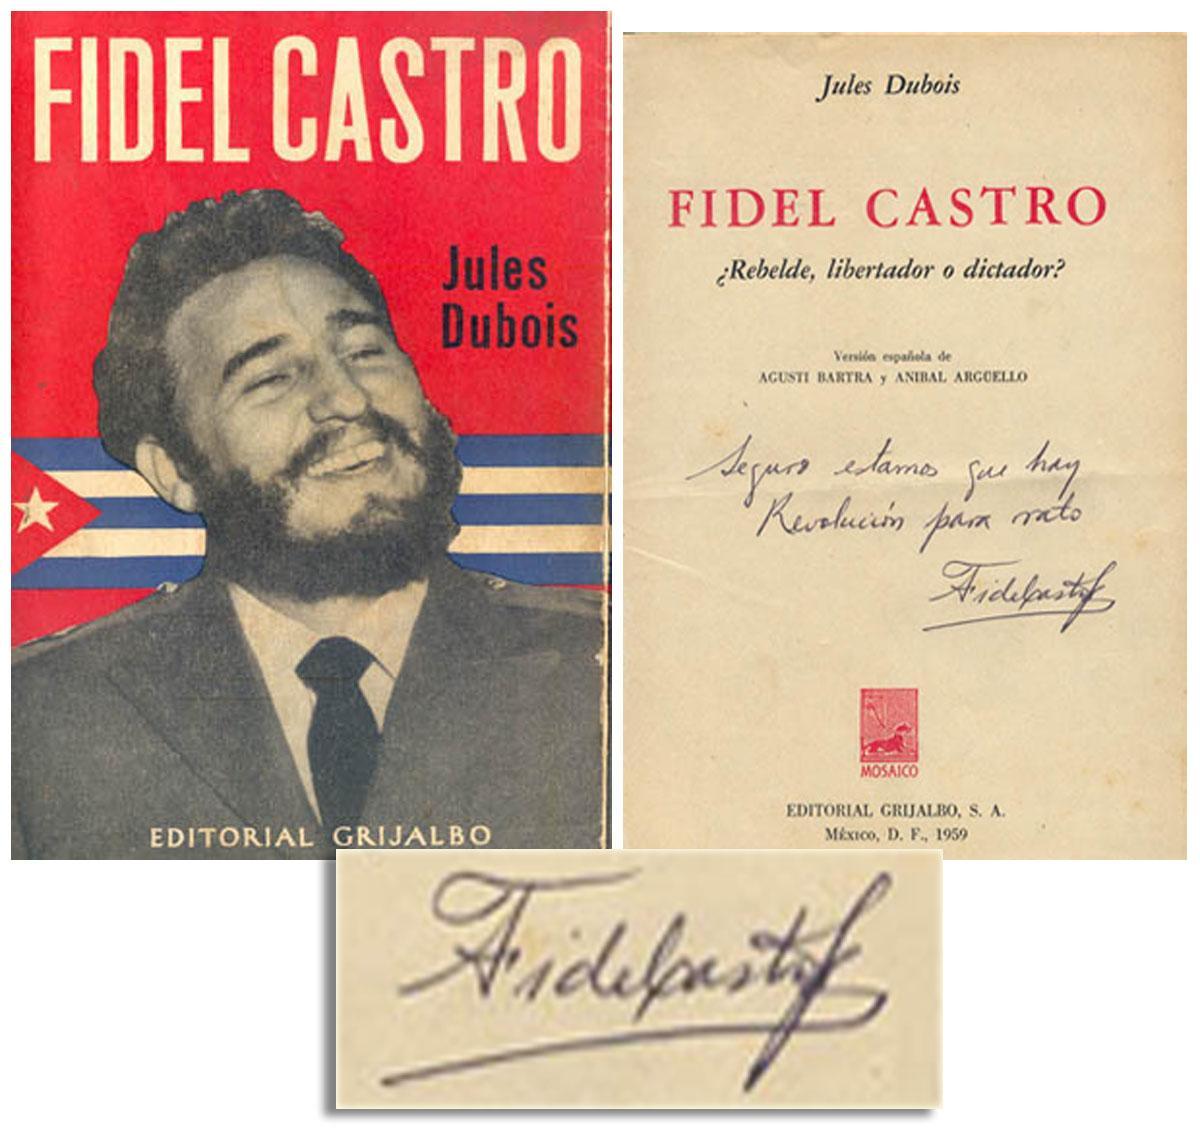 the reign of fidel castro essay Fidel alejandro castro ruz (spanish: [fiˈðel ˈkastɾo] ( listen) 13 august 1926 - 25 november 2016) was a cuban communist revolutionary and politician who governed the republic of cuba as prime.